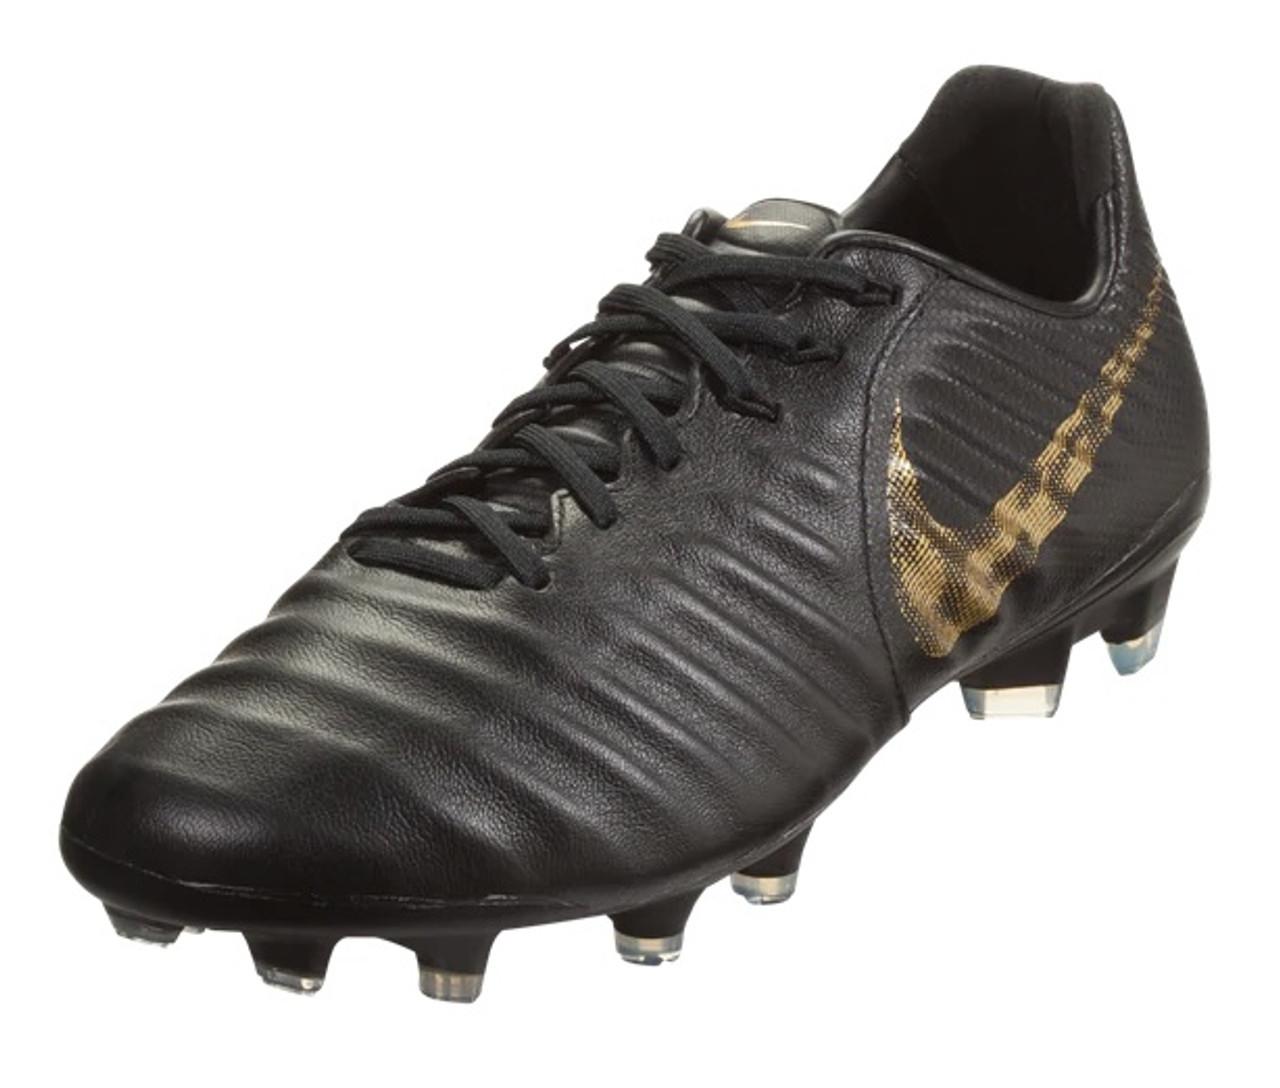 9bfcdced500d Nike Tiempo Legend 7 Pro CA FG - Black/ Vivid Gold (06719) - ohp soccer